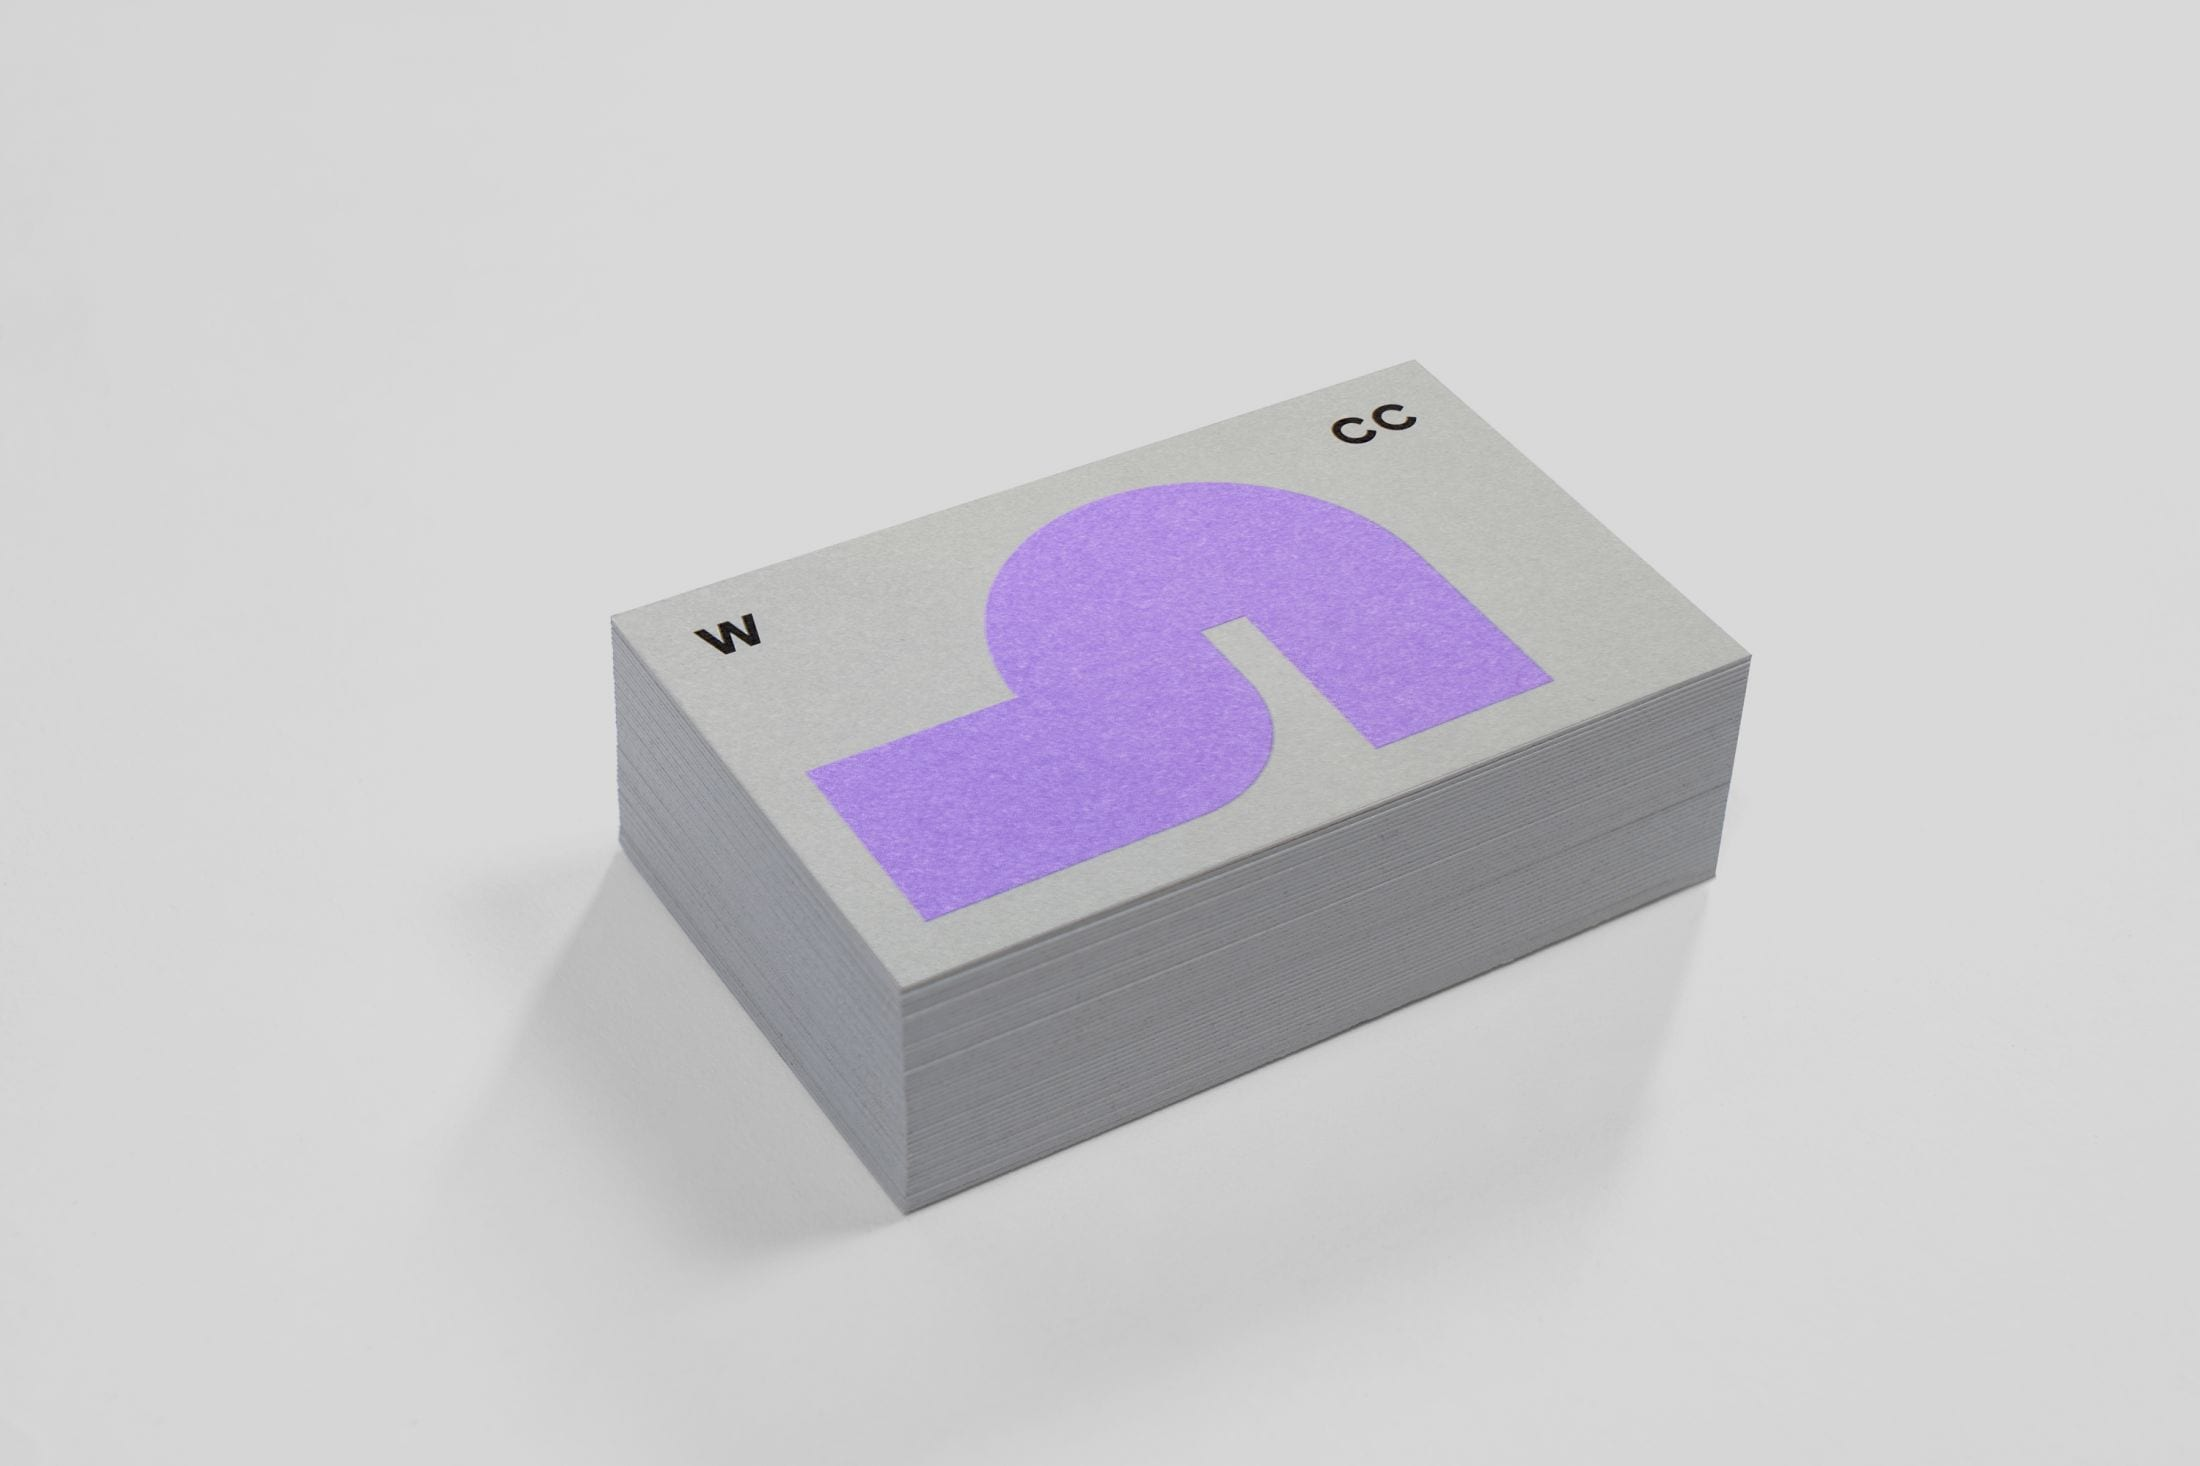 980112afac50c967ca77dac4749aa790242a27b0 2200 - Nová geometrická vizuální identita a web pro Women's Creative Collective